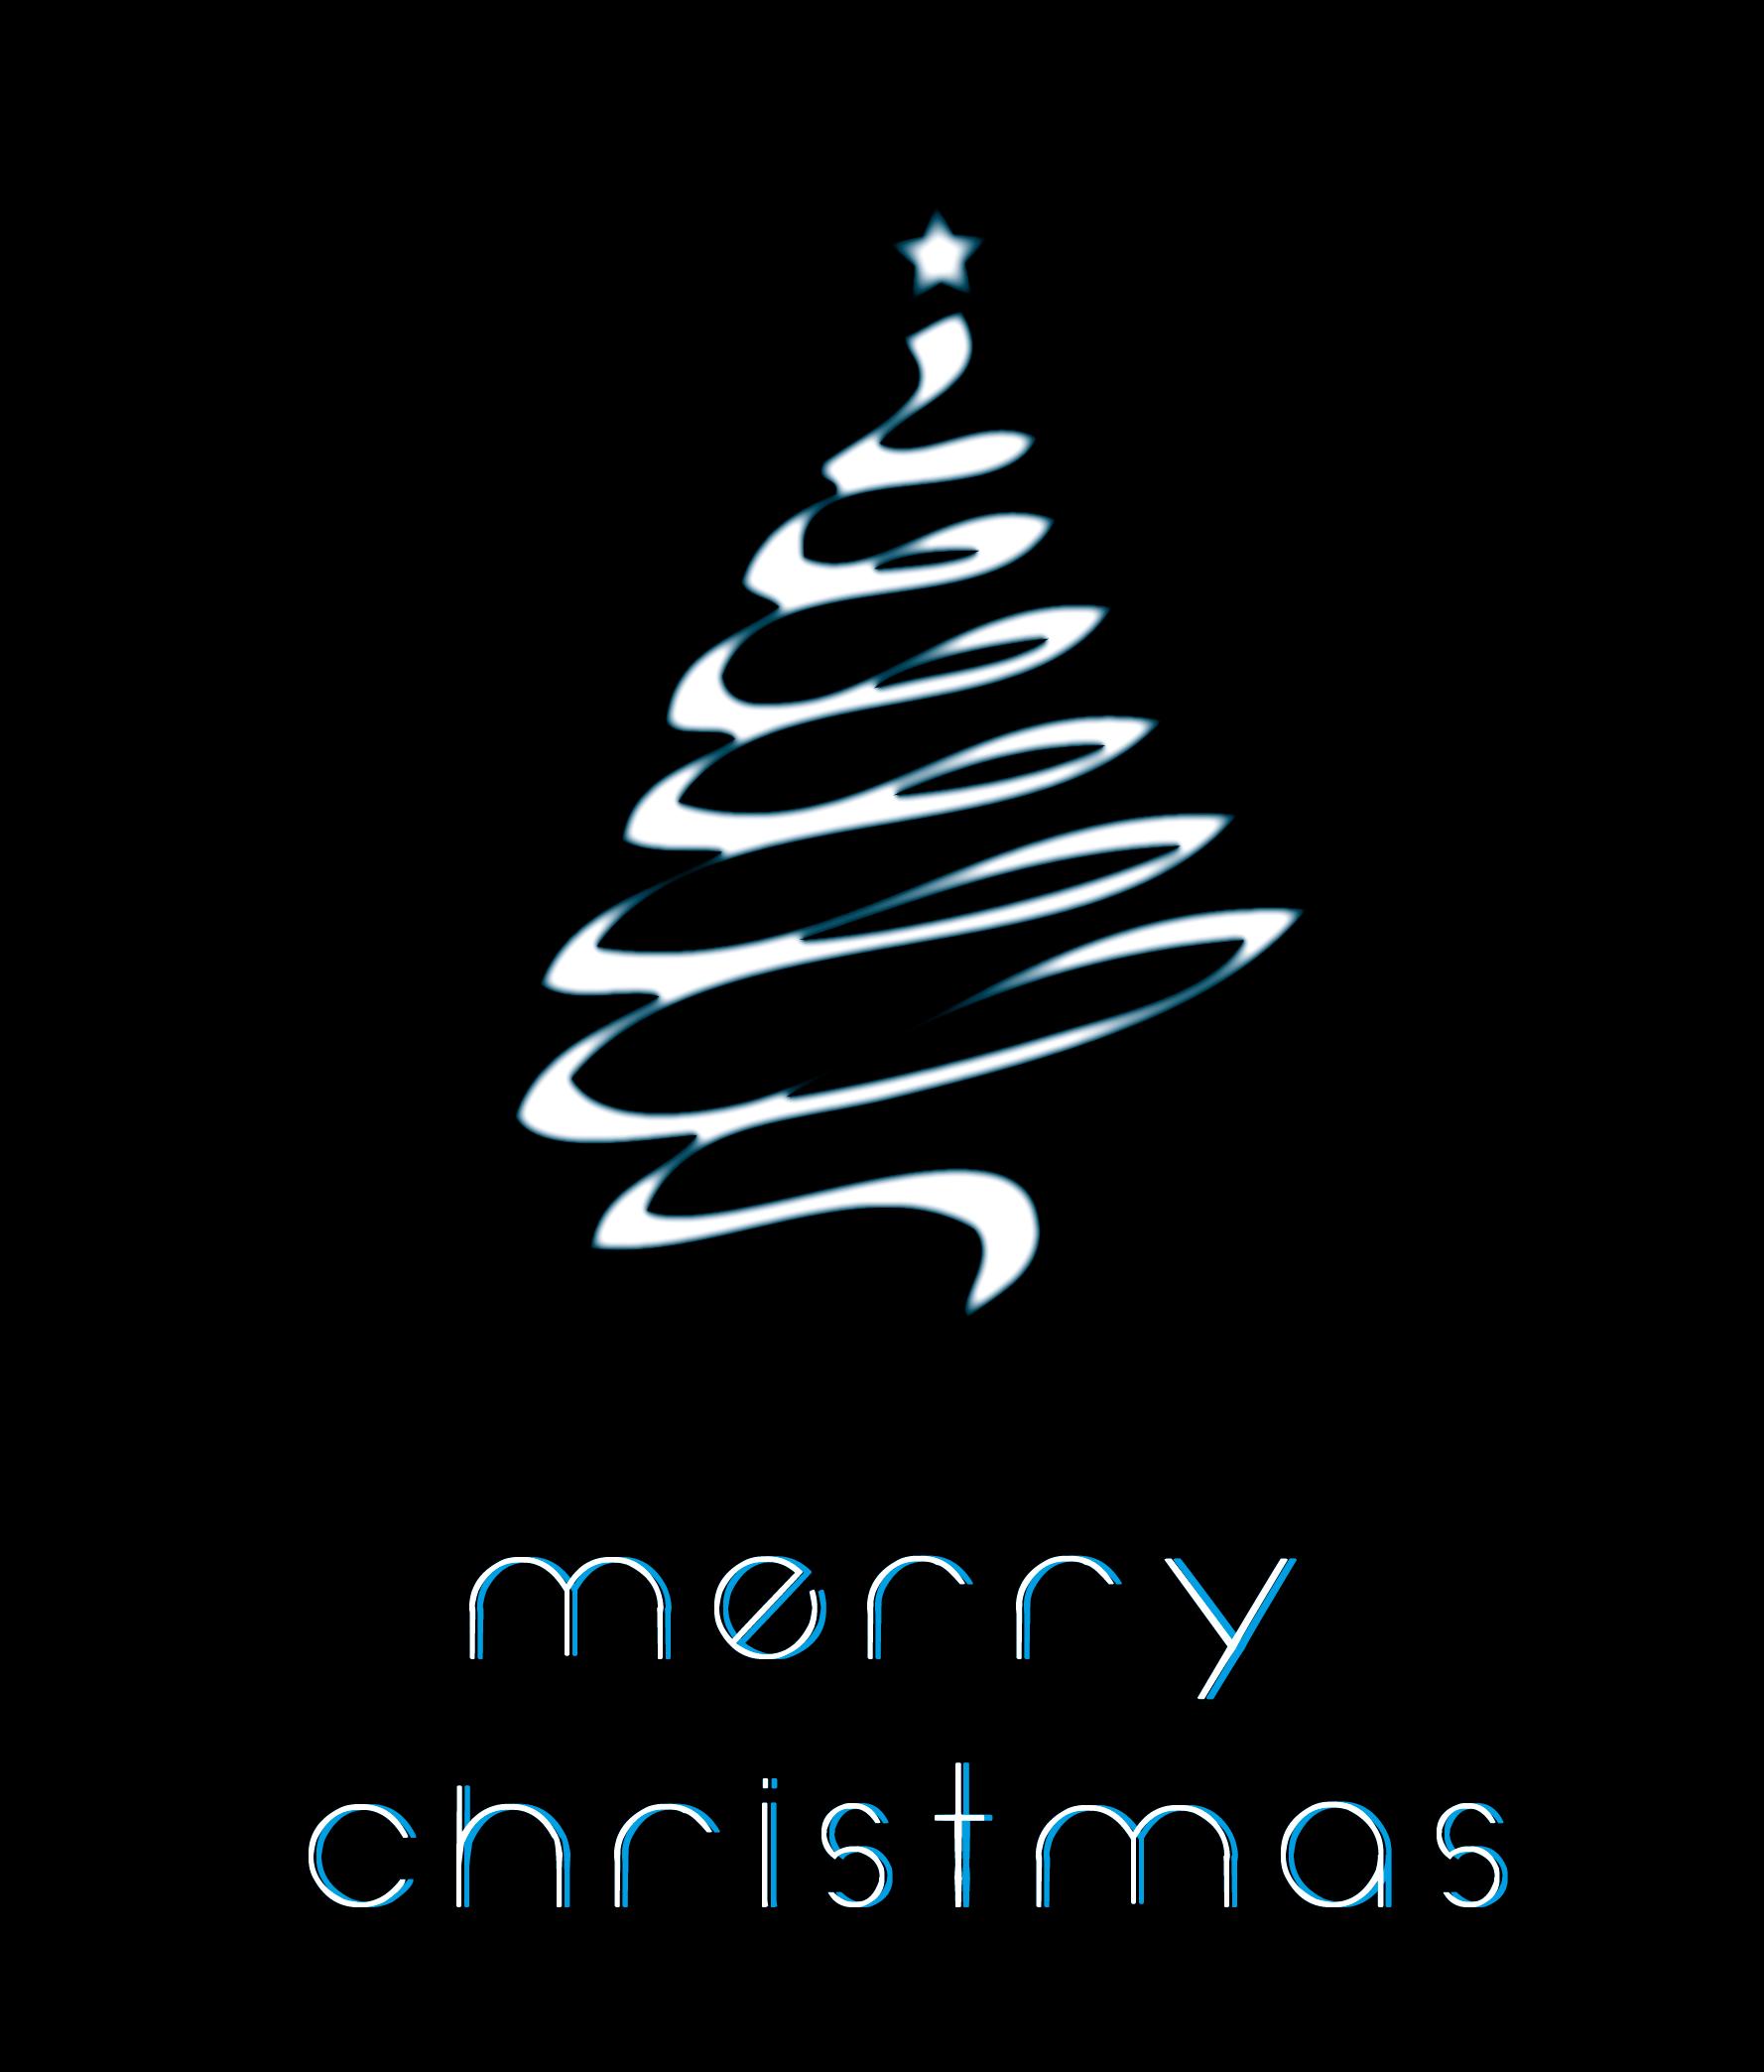 Christmas Tree Cards Designs.Christmas Card Design 2 Christmas Tree By Rgunx On Deviantart